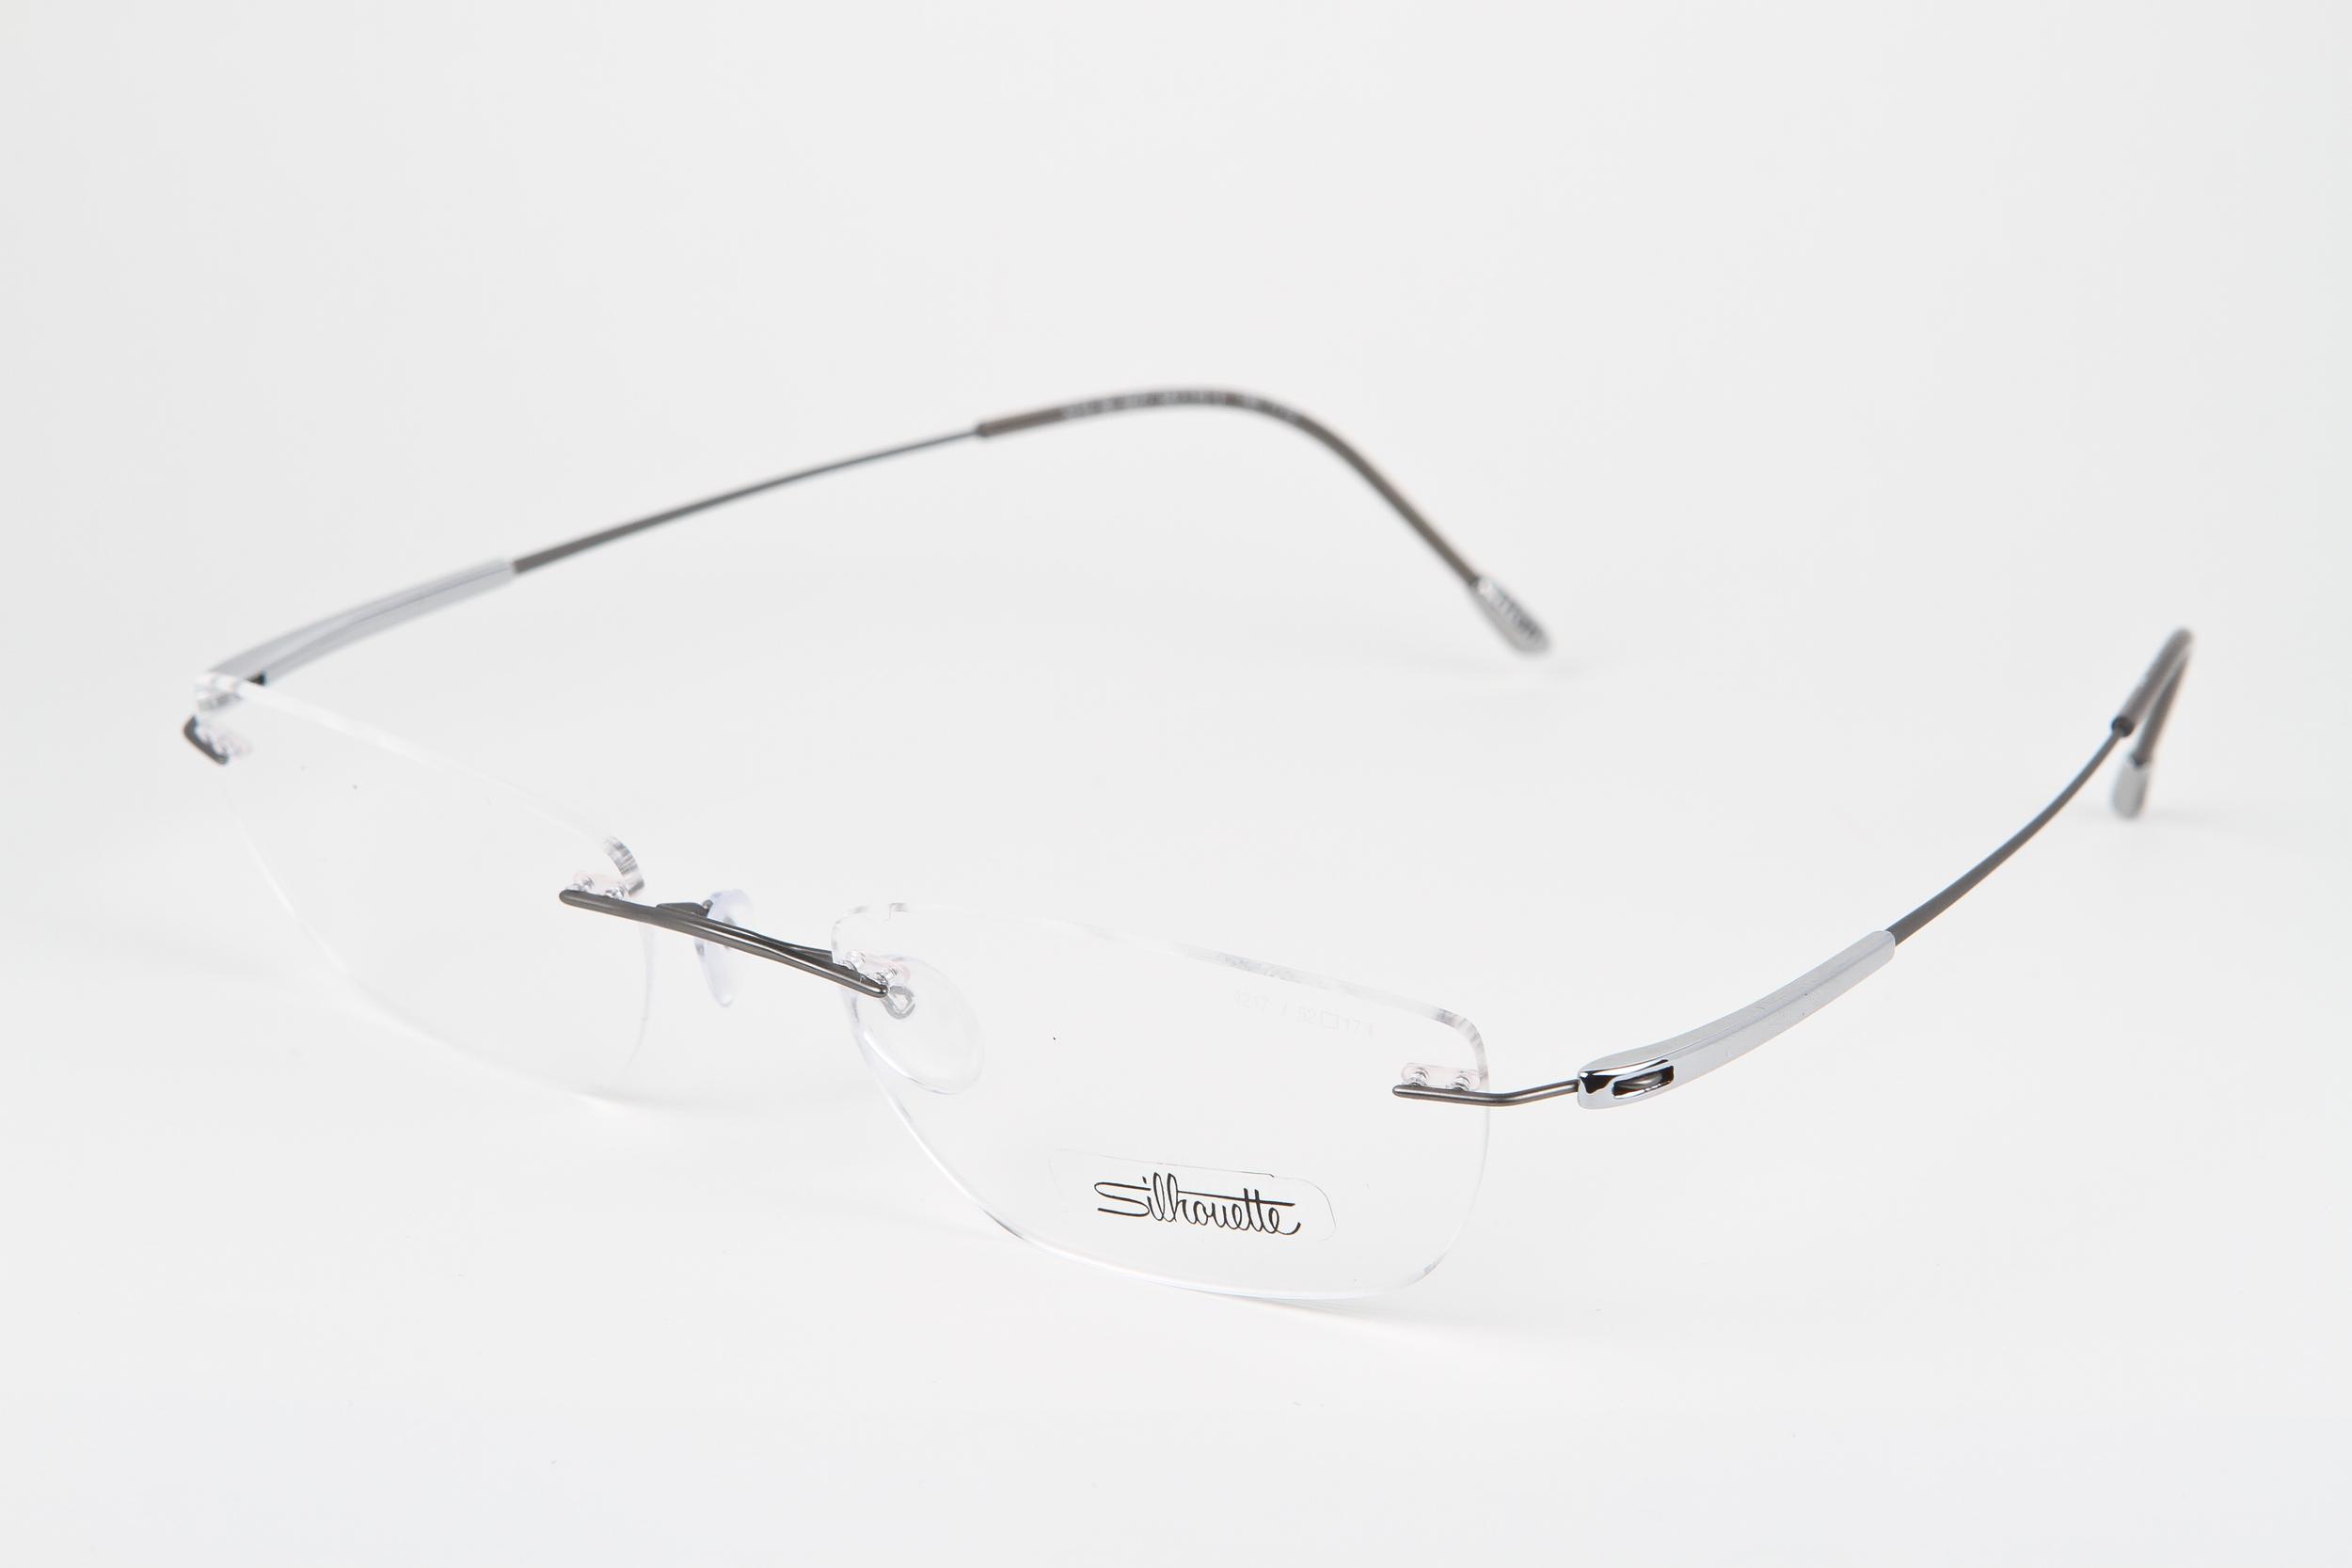 bd909338827d7 Silhouette Metal lightweight — BFOCUS-EYEWEAR